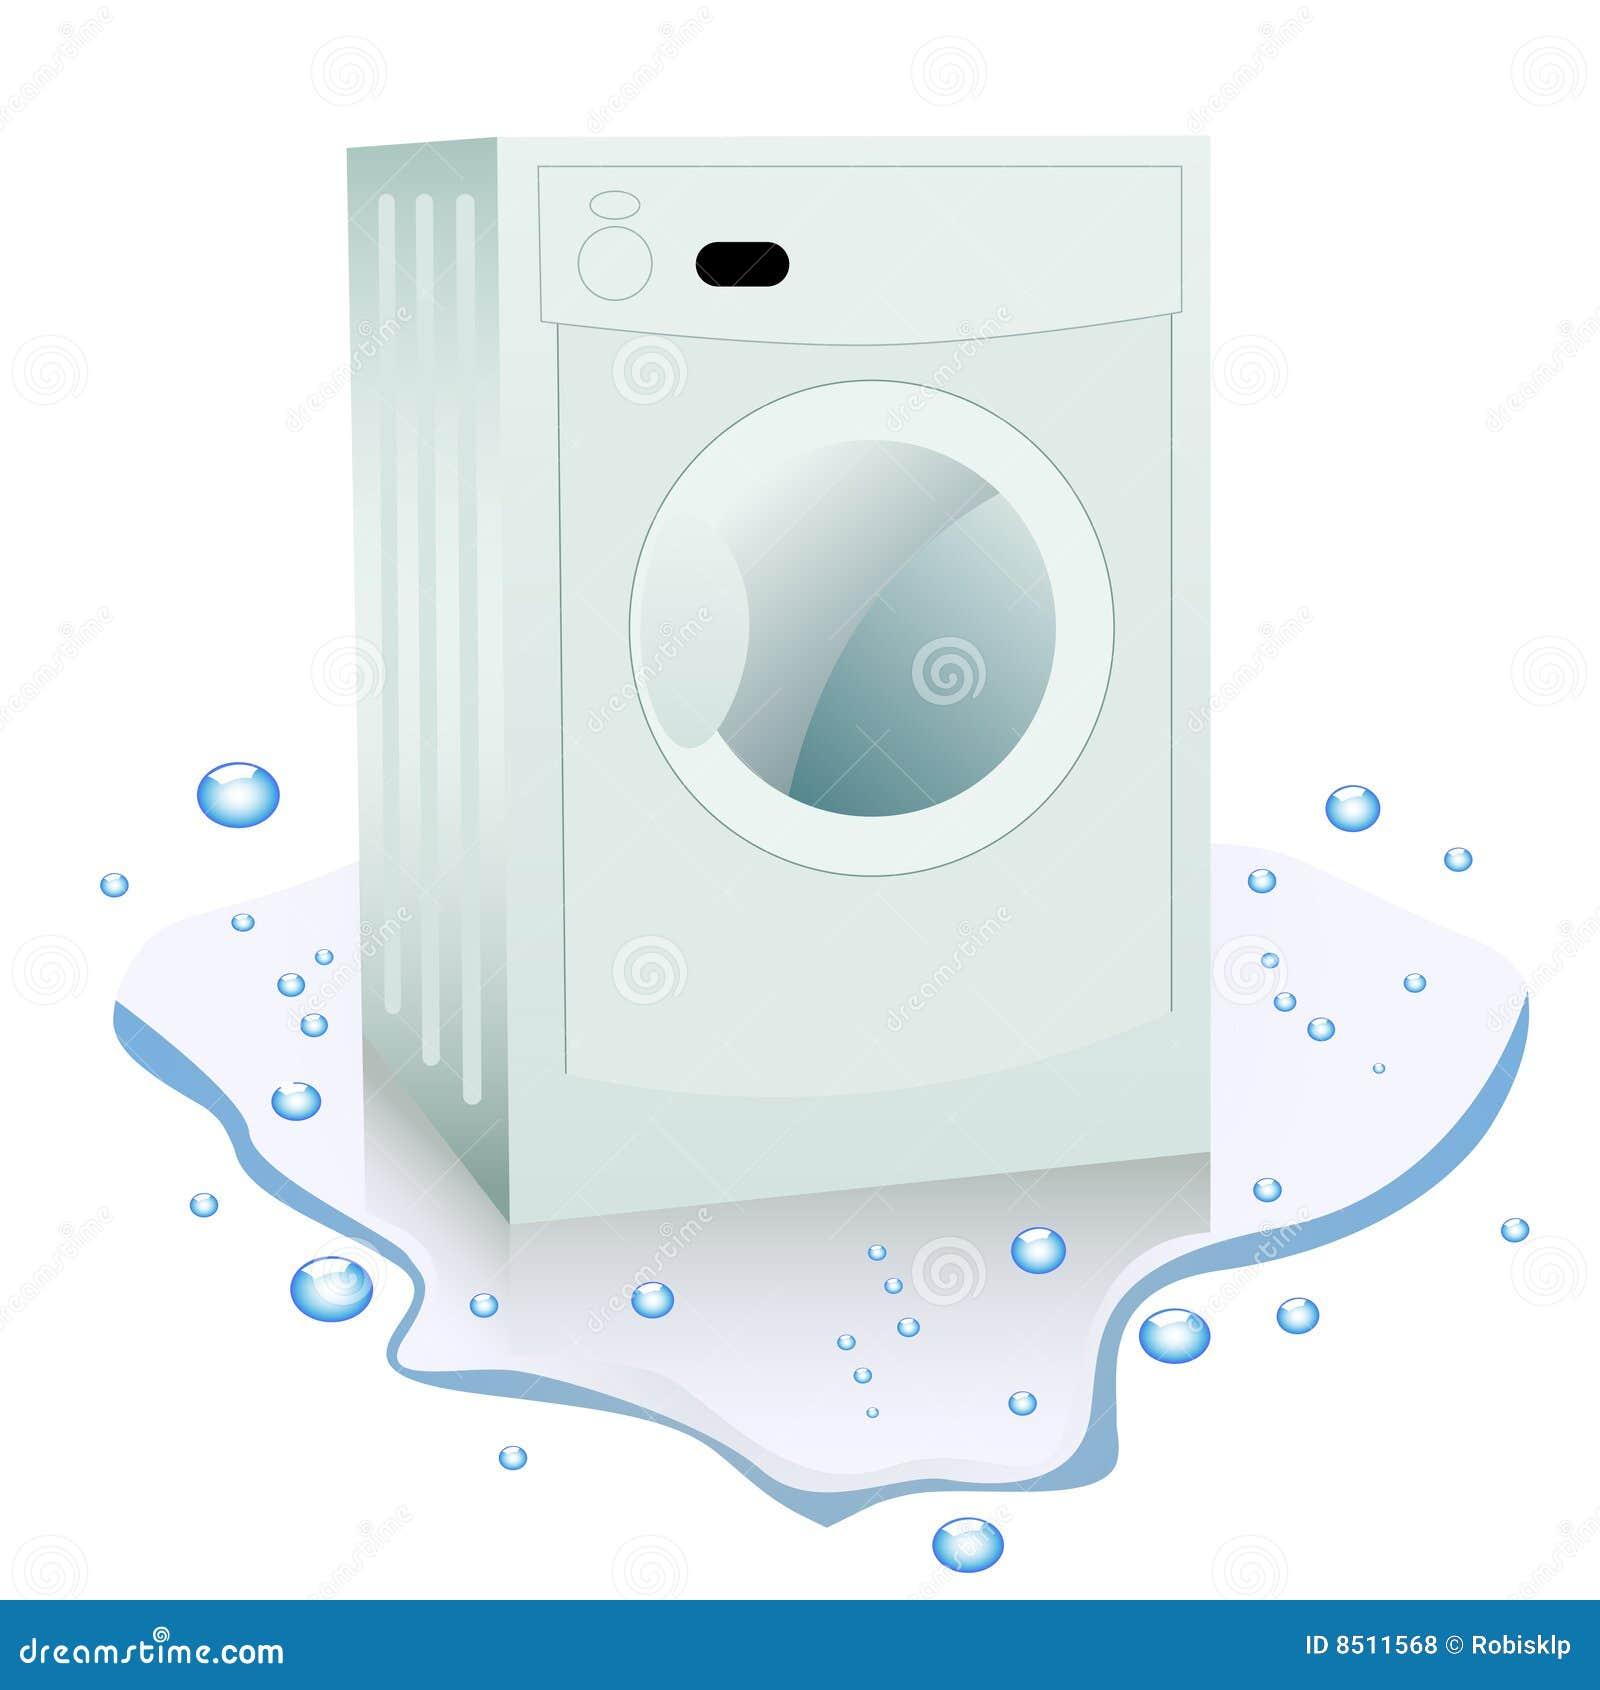 water free washing machine